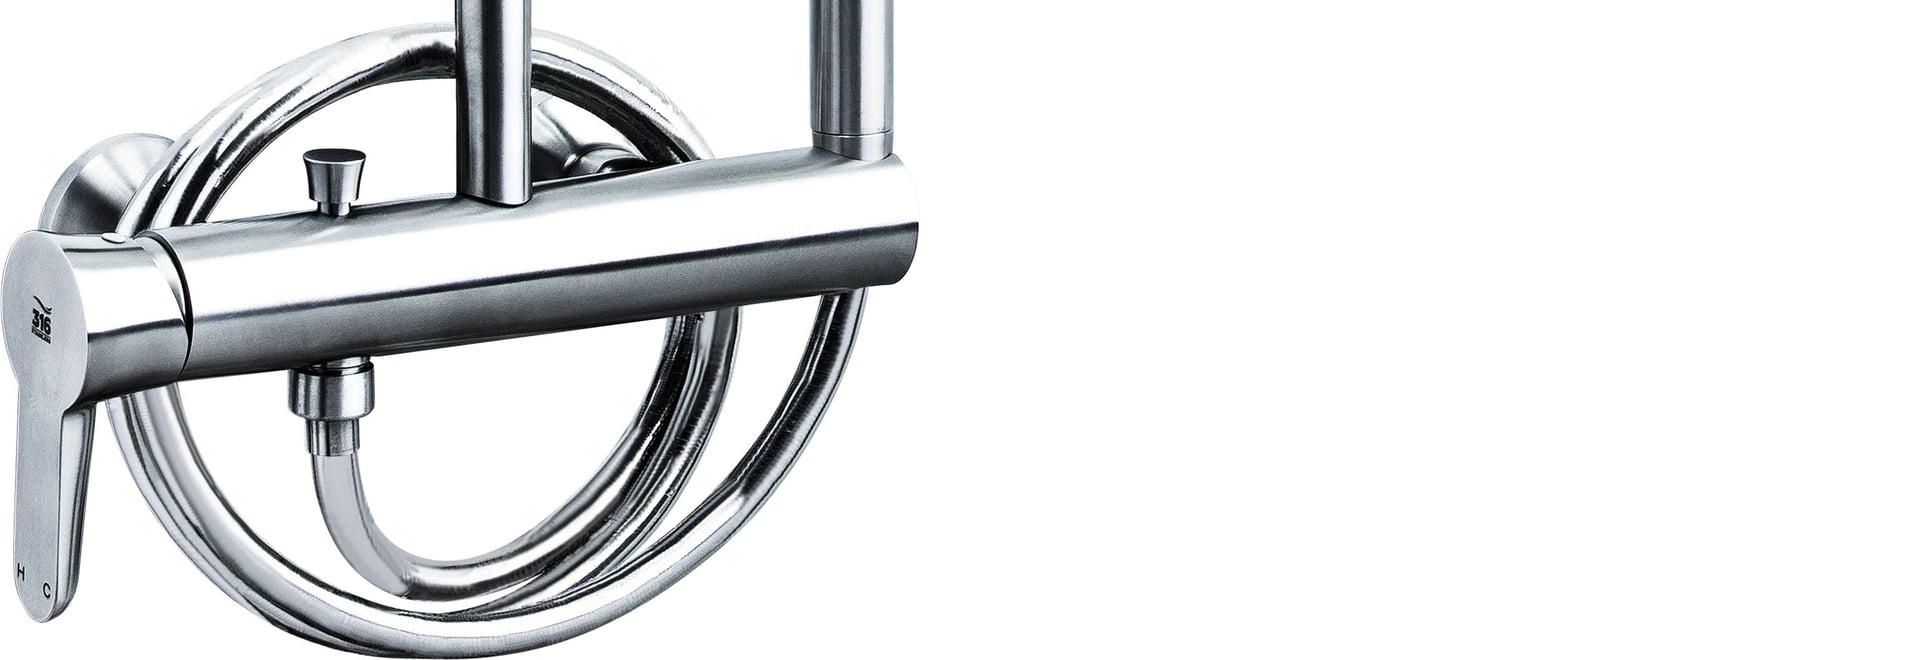 Stainless steel 316 marine grade showerset